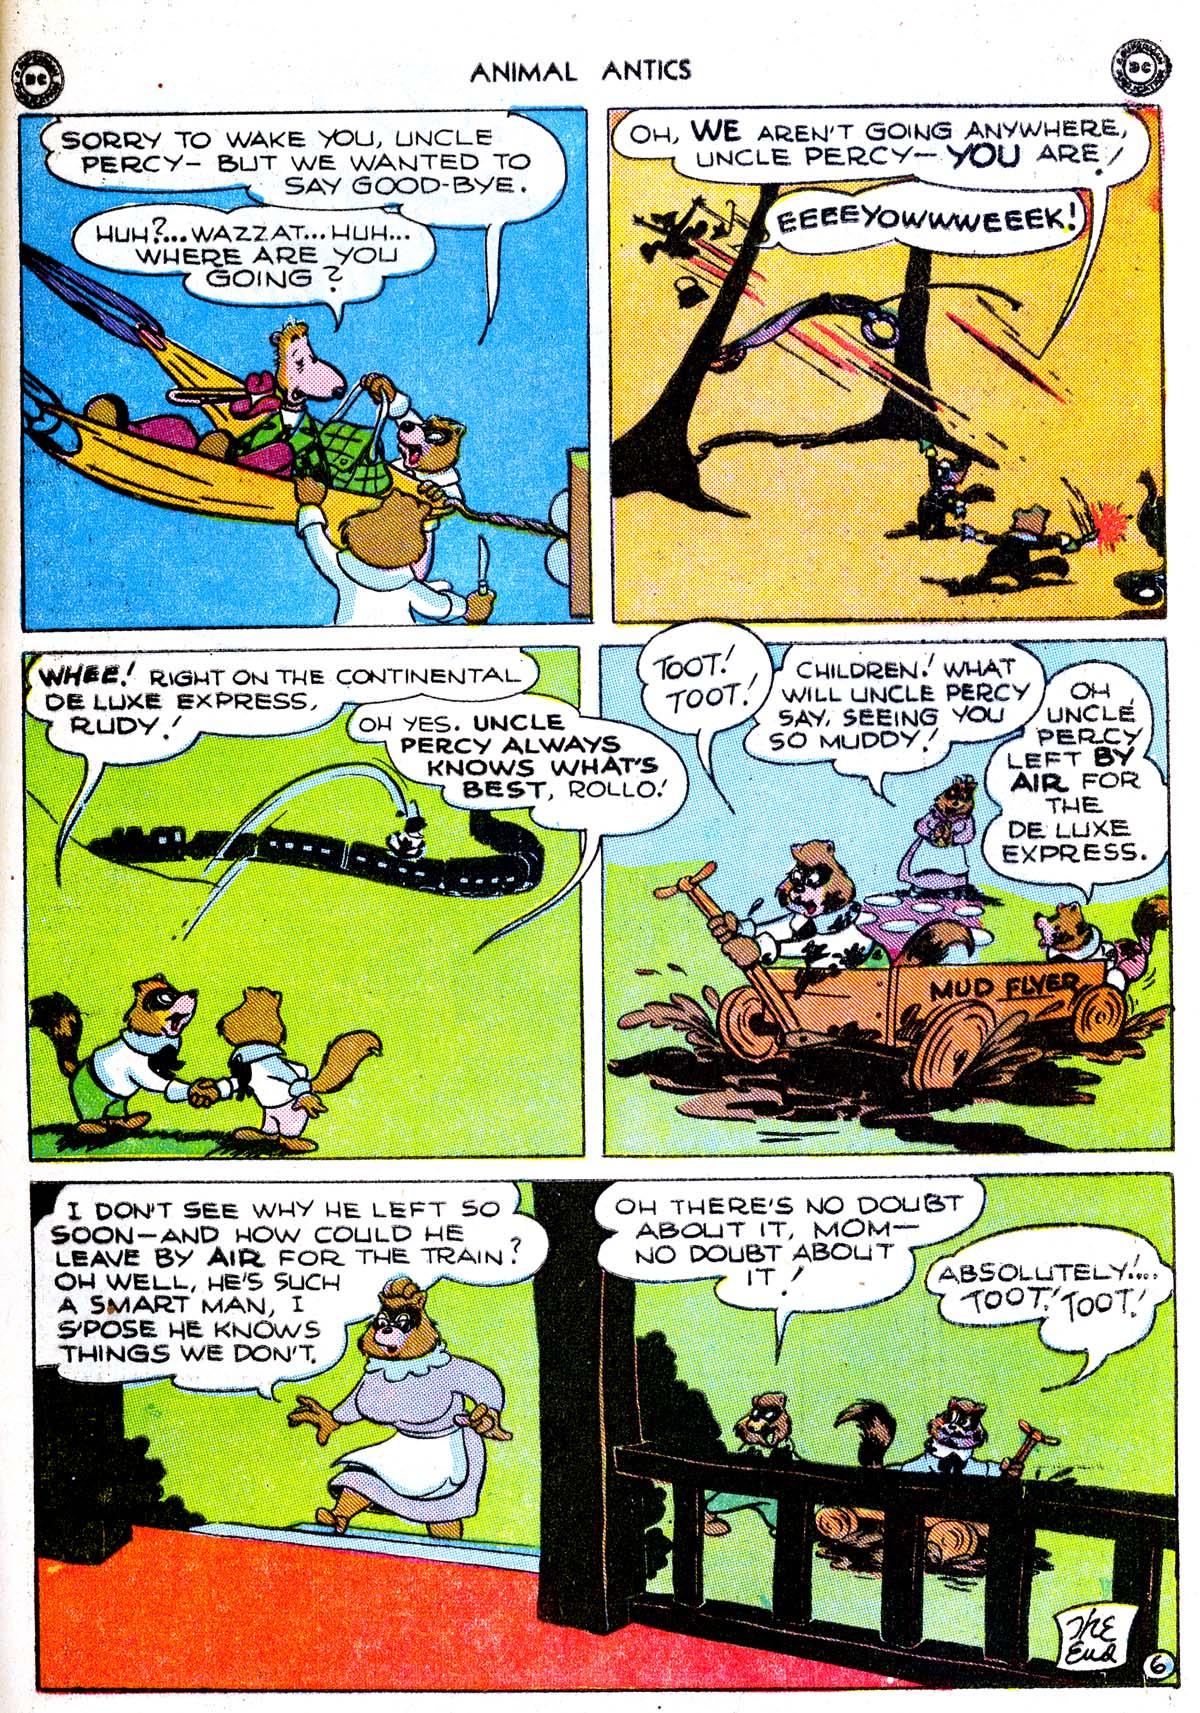 Read online Animal Antics comic -  Issue #1 - 49